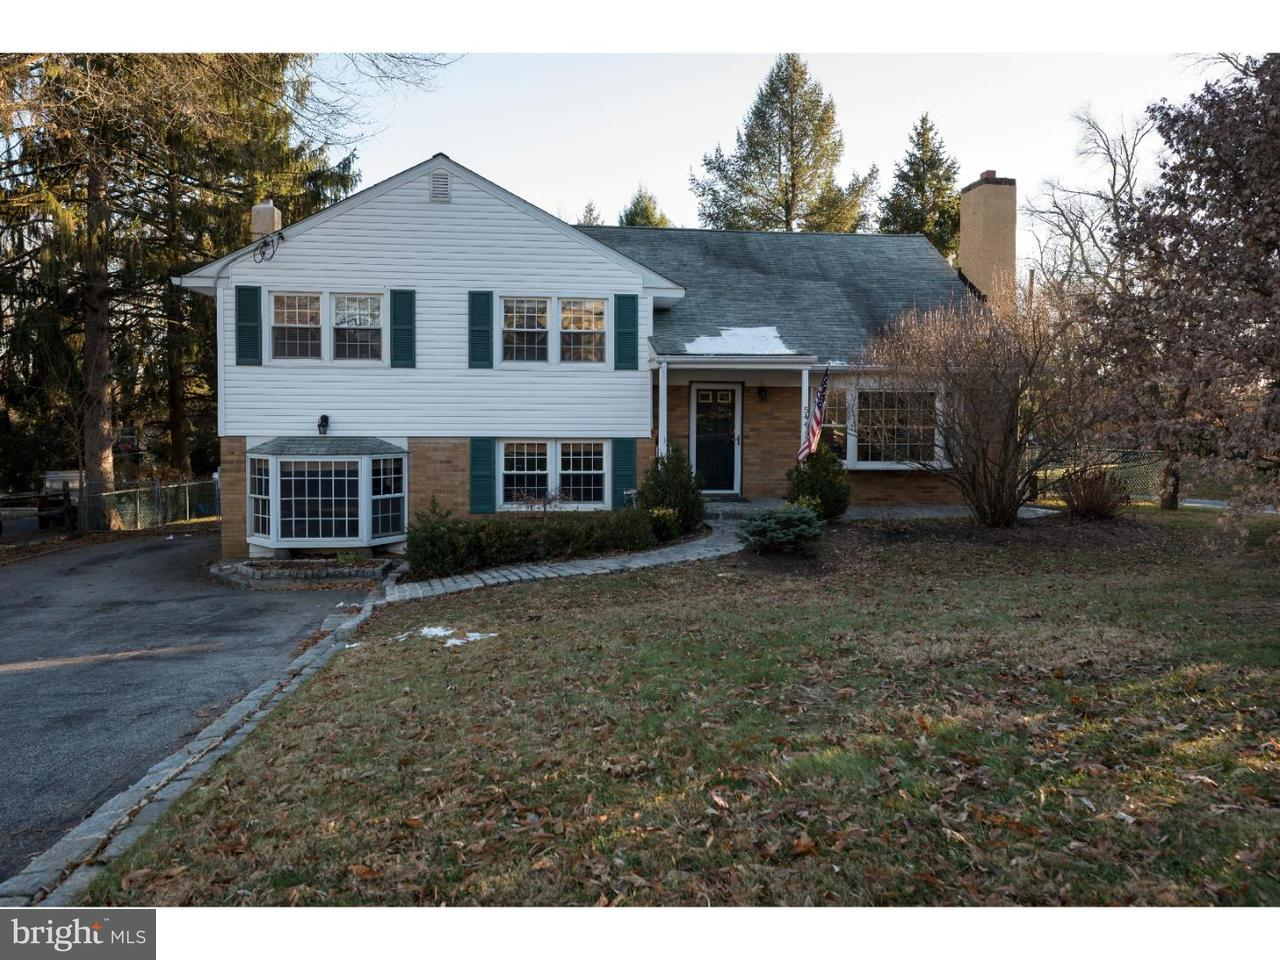 Single Family Home for Rent at 544 KROMER Avenue Berwyn, Pennsylvania 19312 United States